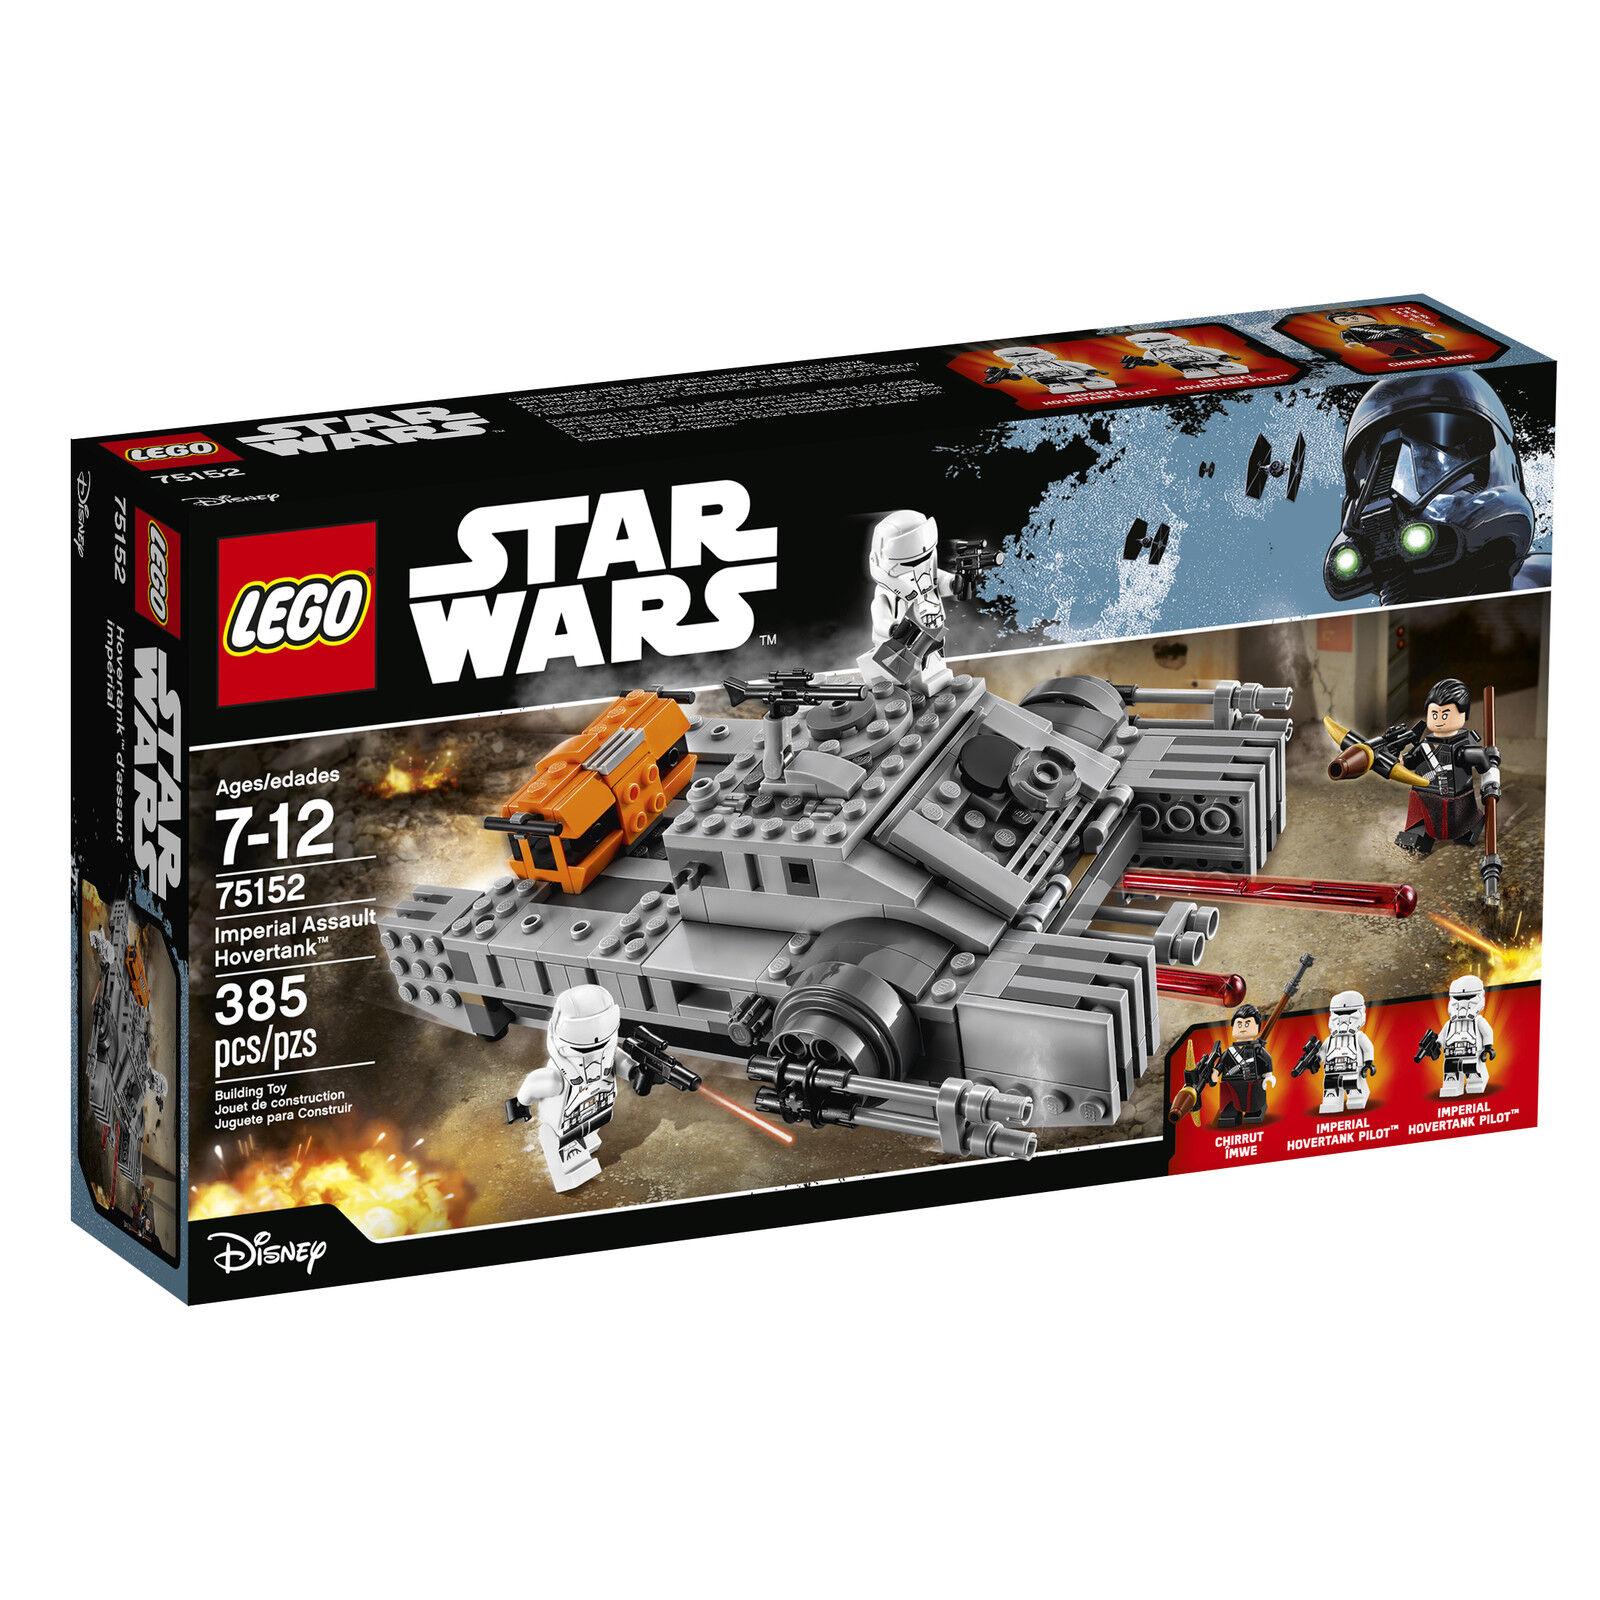 LEGO® Star Wars™ 75152 Imperial Assault HoGrünank™ NEU OVP NEW MISB NRFB